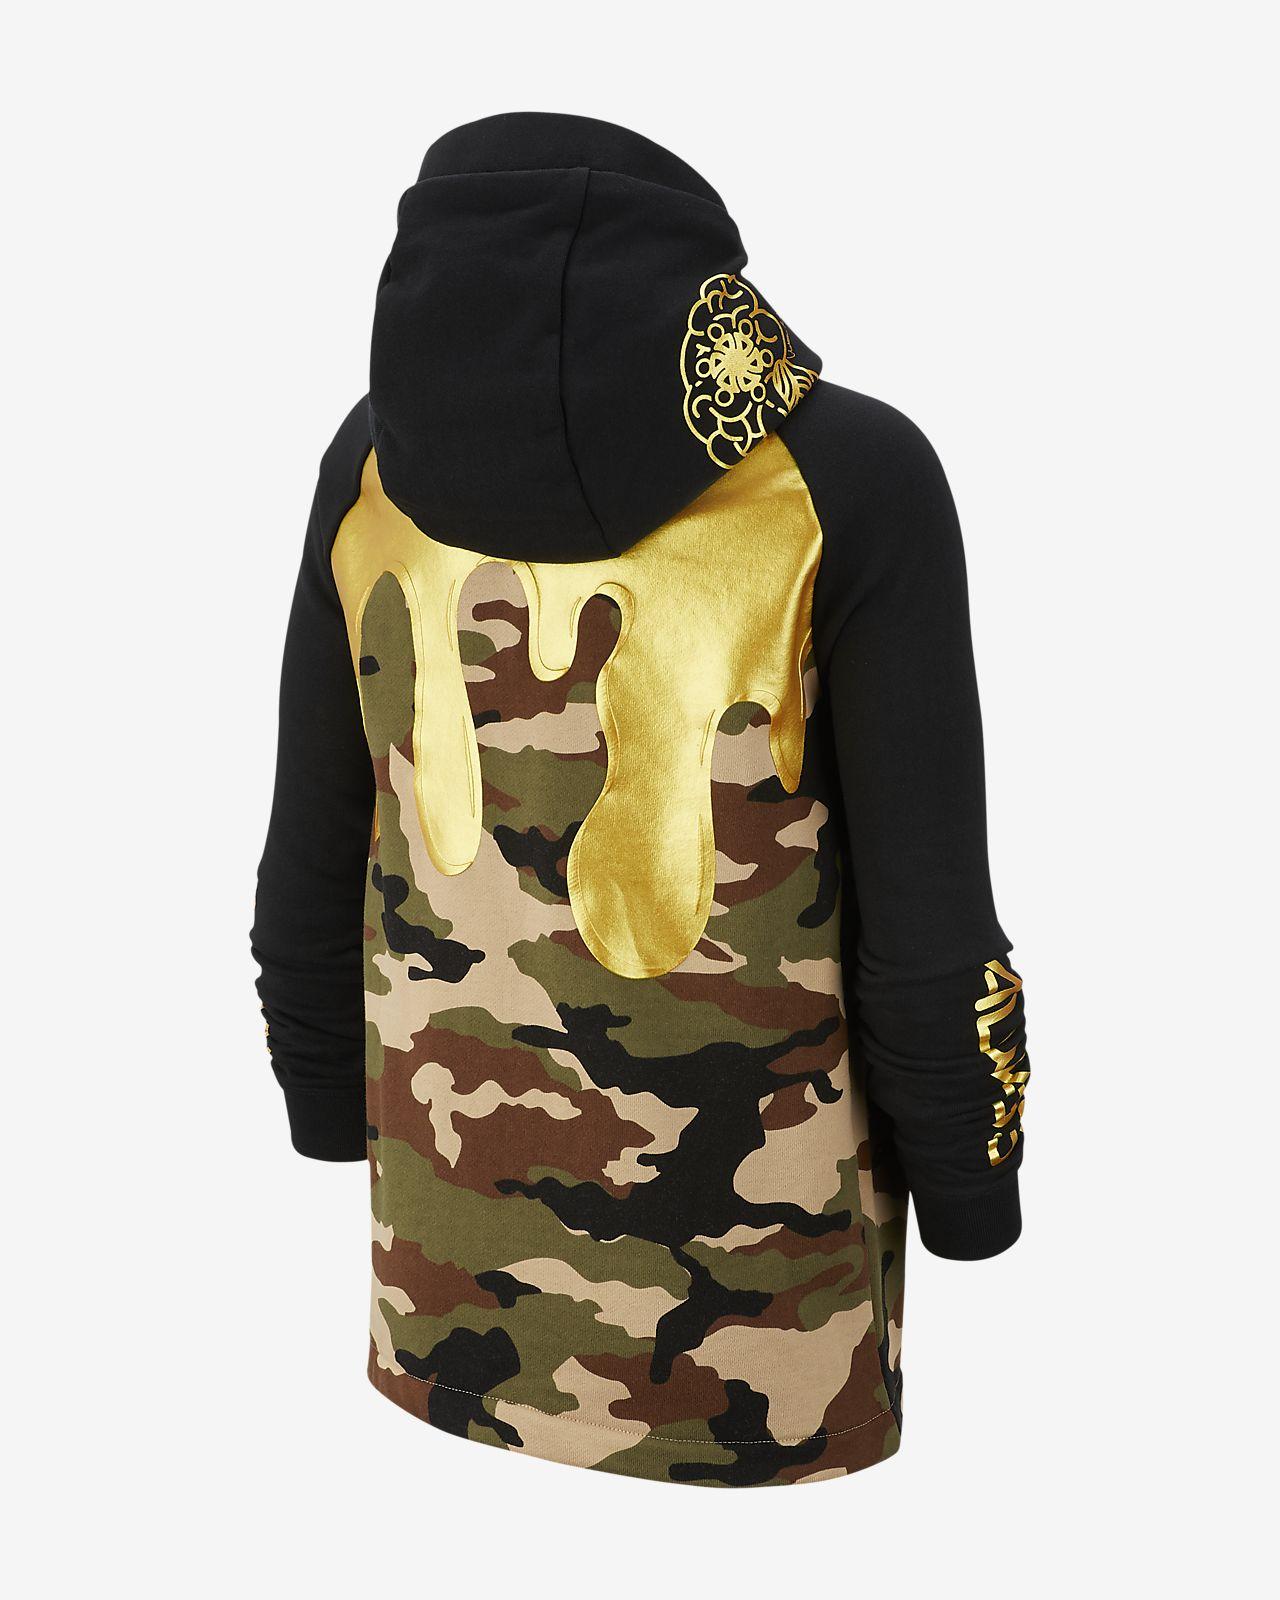 baa00ff539cc Aiden s Nike Sportswear (Doernbecher Freestyle) Big Kids  (Boys ...